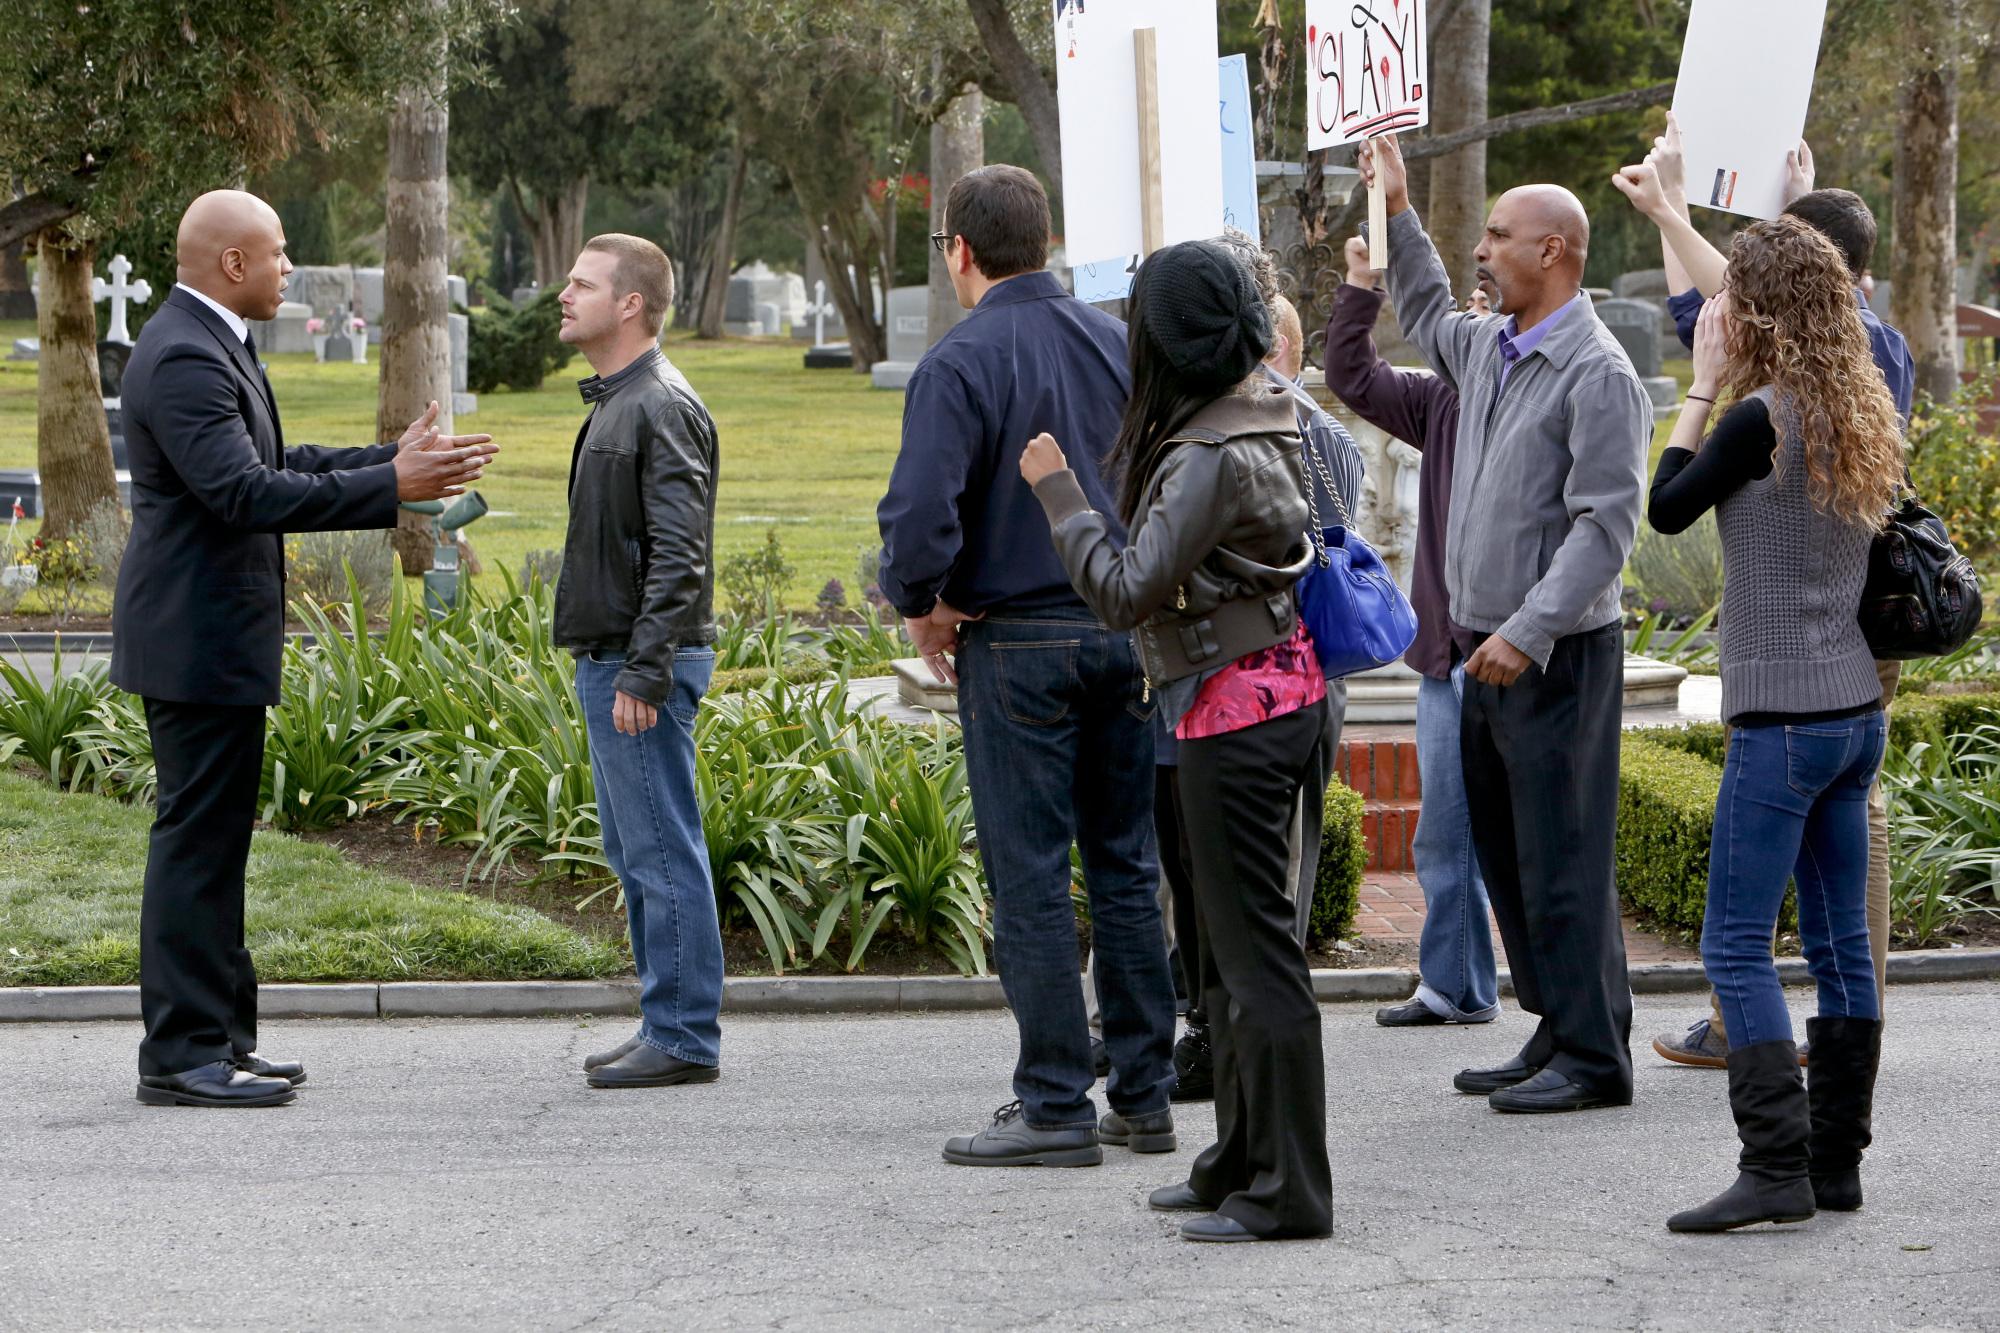 NCIS: LOS ANGELES - Season 4 - Episode 20